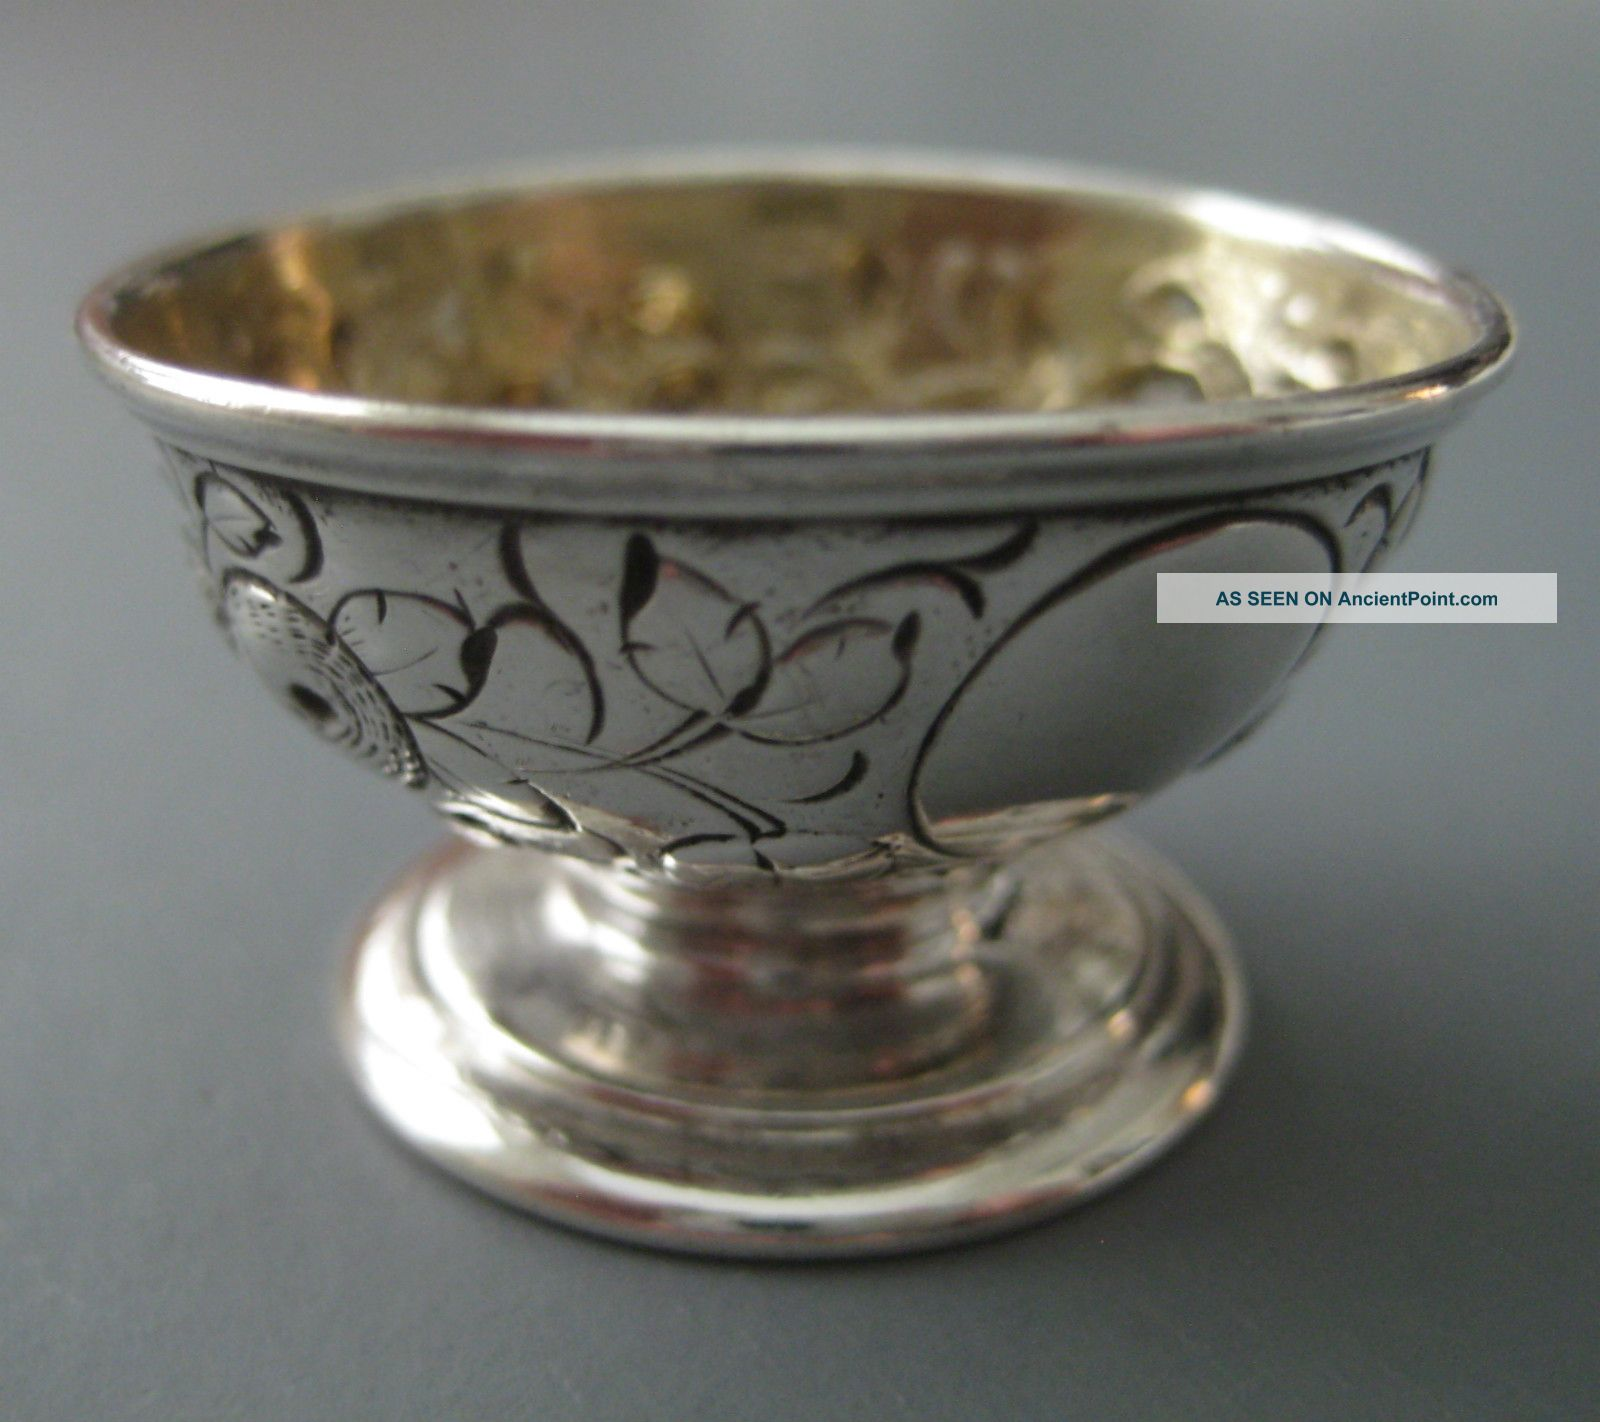 Brilliant Cut Coin Silver Salt Cellar A E W Andrew Elliot Warner 1850s Mint Coin Silver (.900) photo